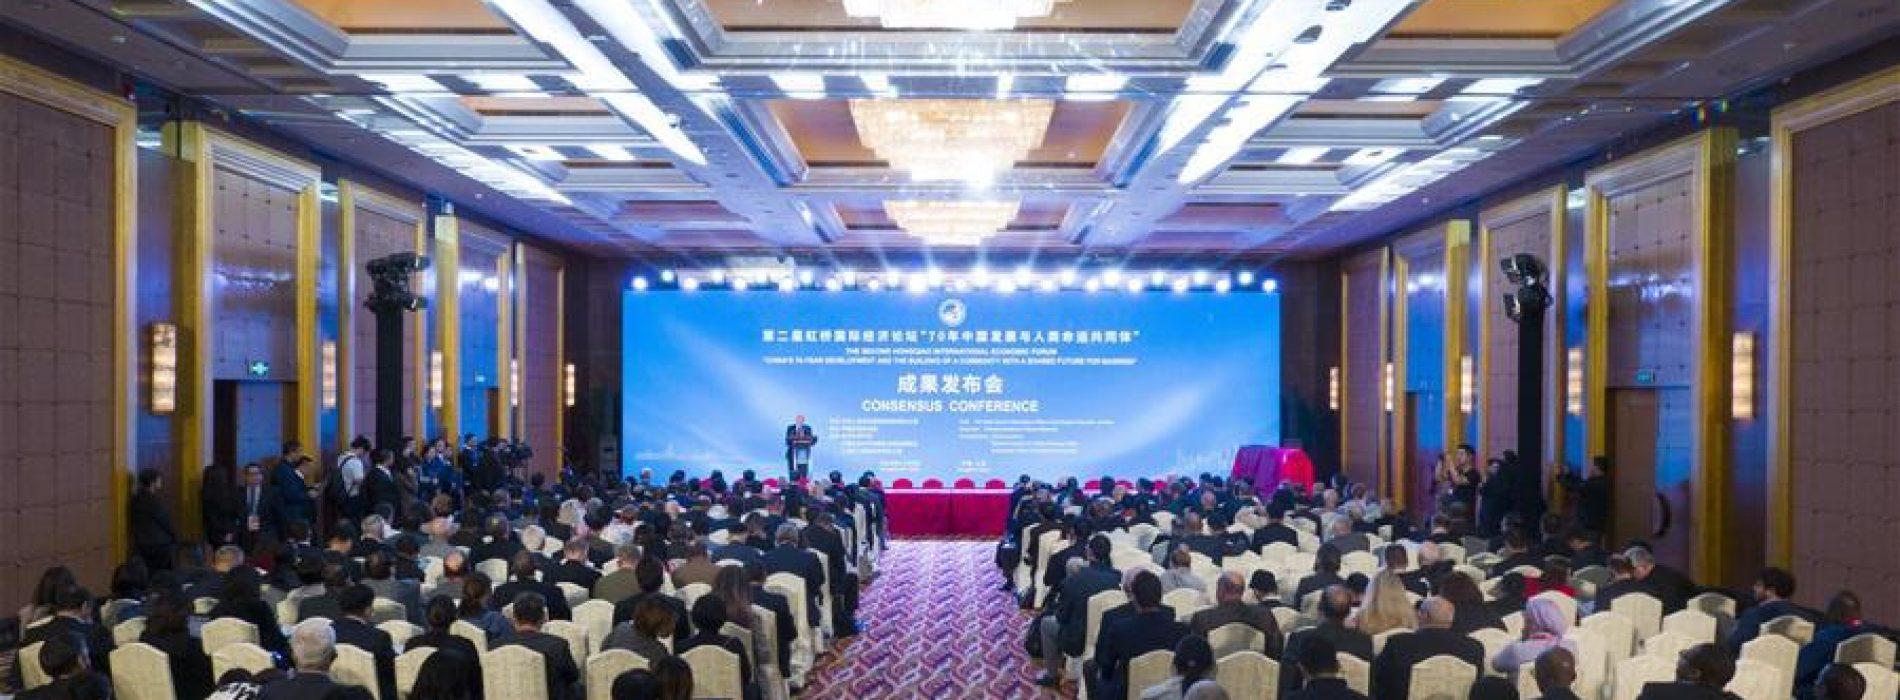 Consejeros del CURI, Emb. Guillermo Valles e Ing. Washington Durán, participaron del II Foro Económico Internacional de Hongqiao